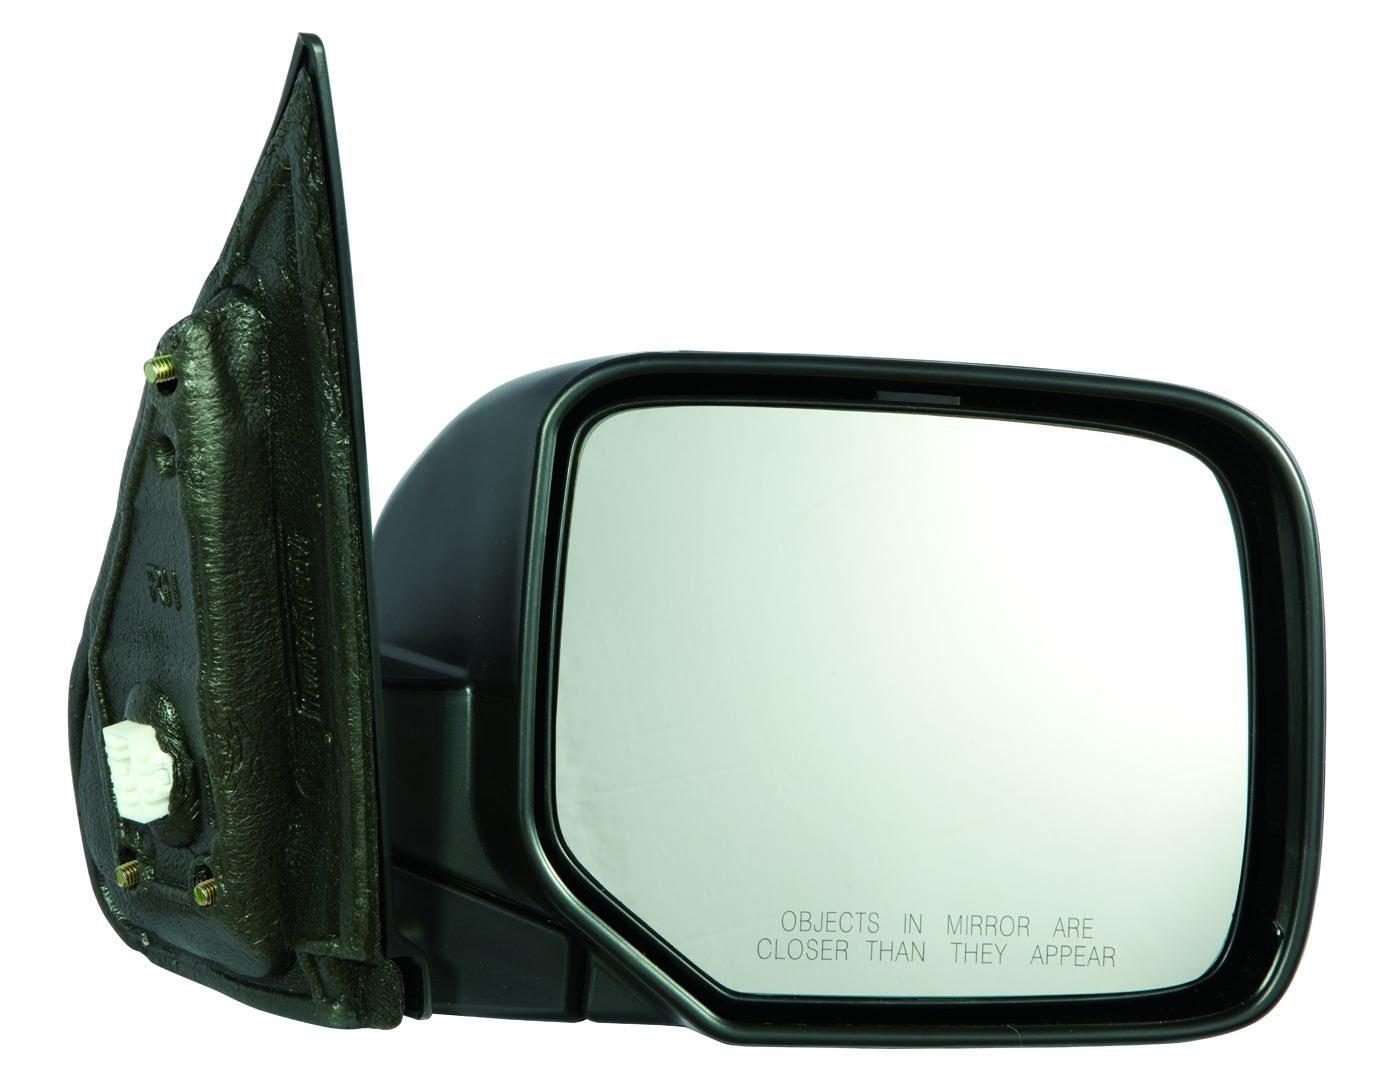 DEPO 317-5420R3EB1 Honda Pilot Passenger Side Textured Non-Heated Power Mirror